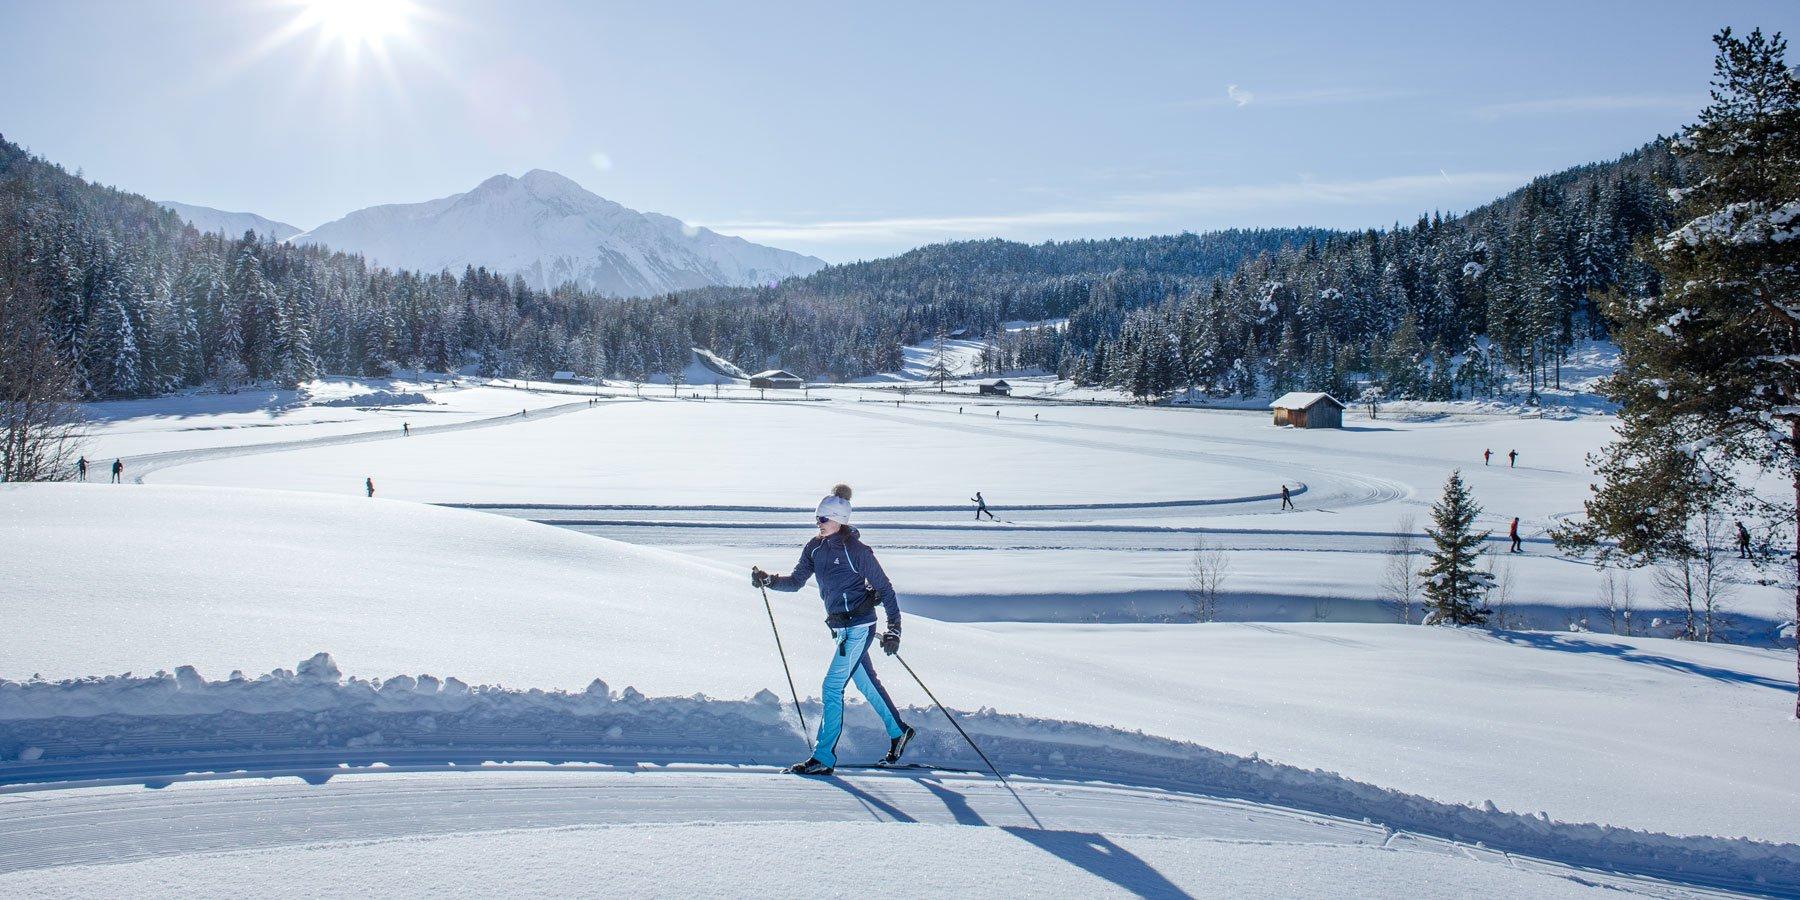 Langlaufen in der Olympiaregion Seefeld